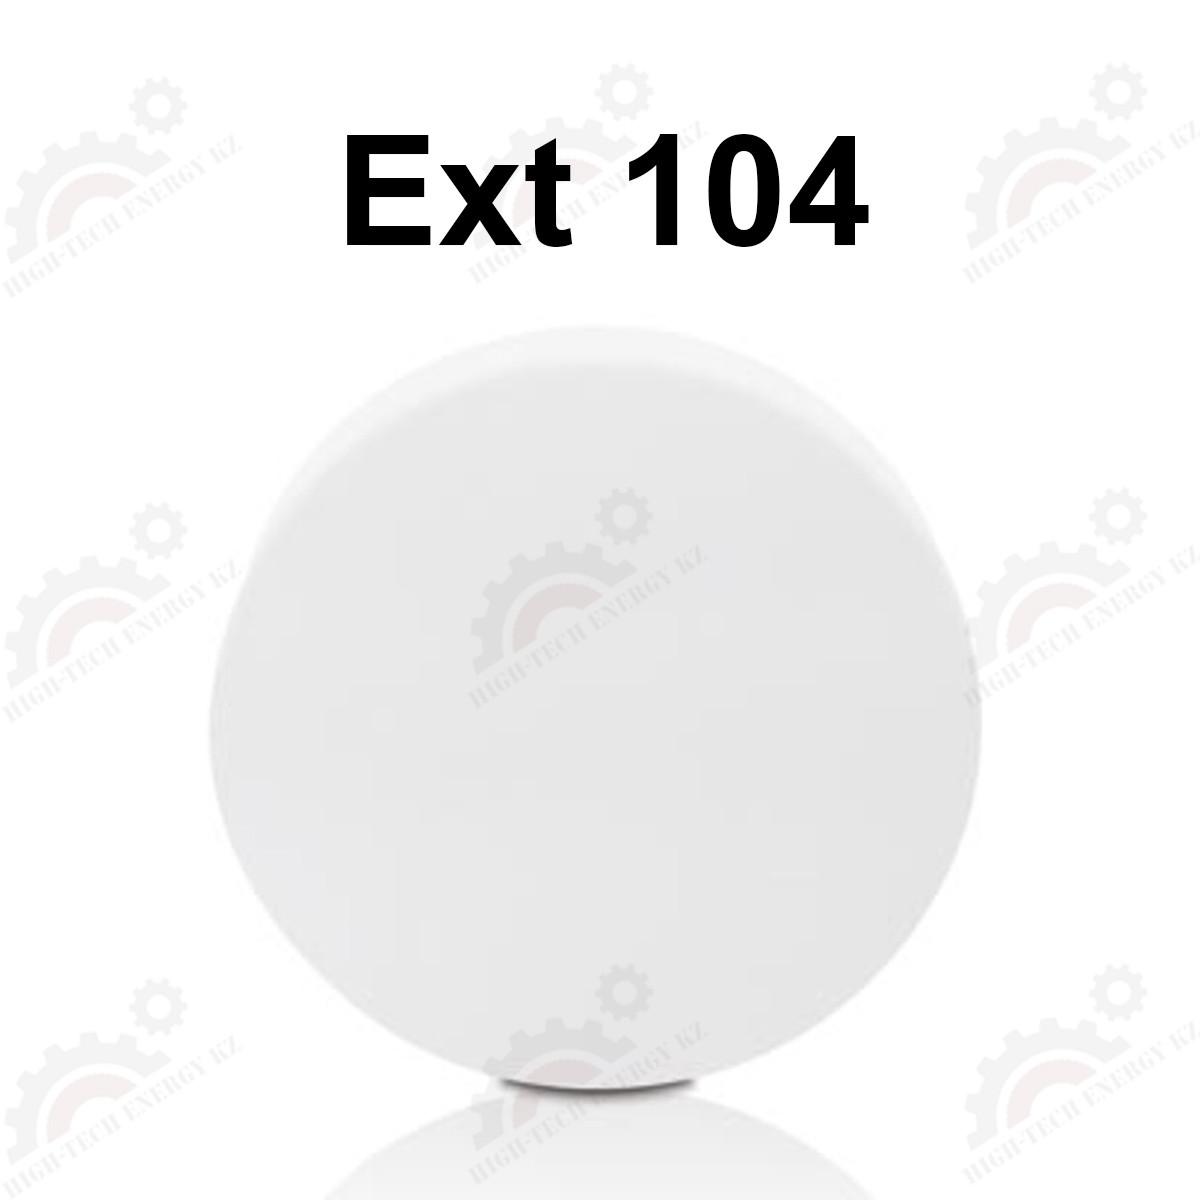 2.4 ГГц 4dBi всенаправленная потолочная антенна Ext 104